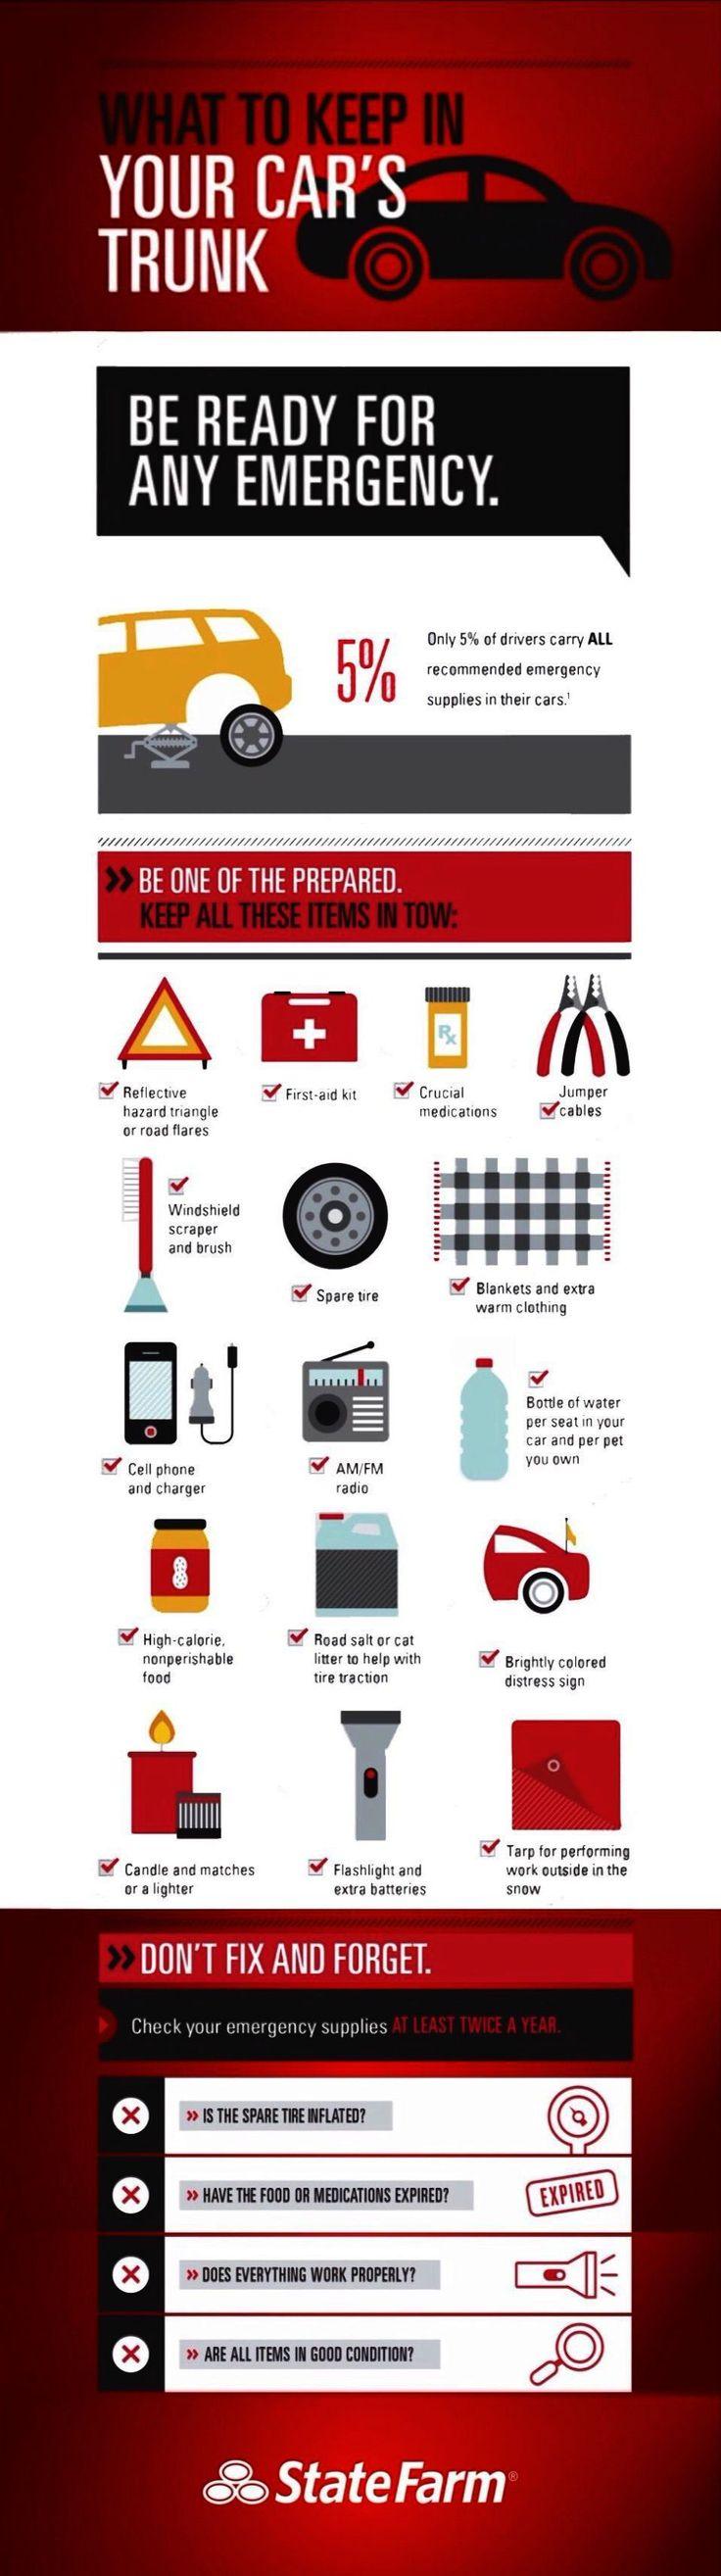 Carson Wentz Highlights Regarding Consumer Reports Used Car Buying Tips Car Emergency Kit Cars Organization Car Maintenance